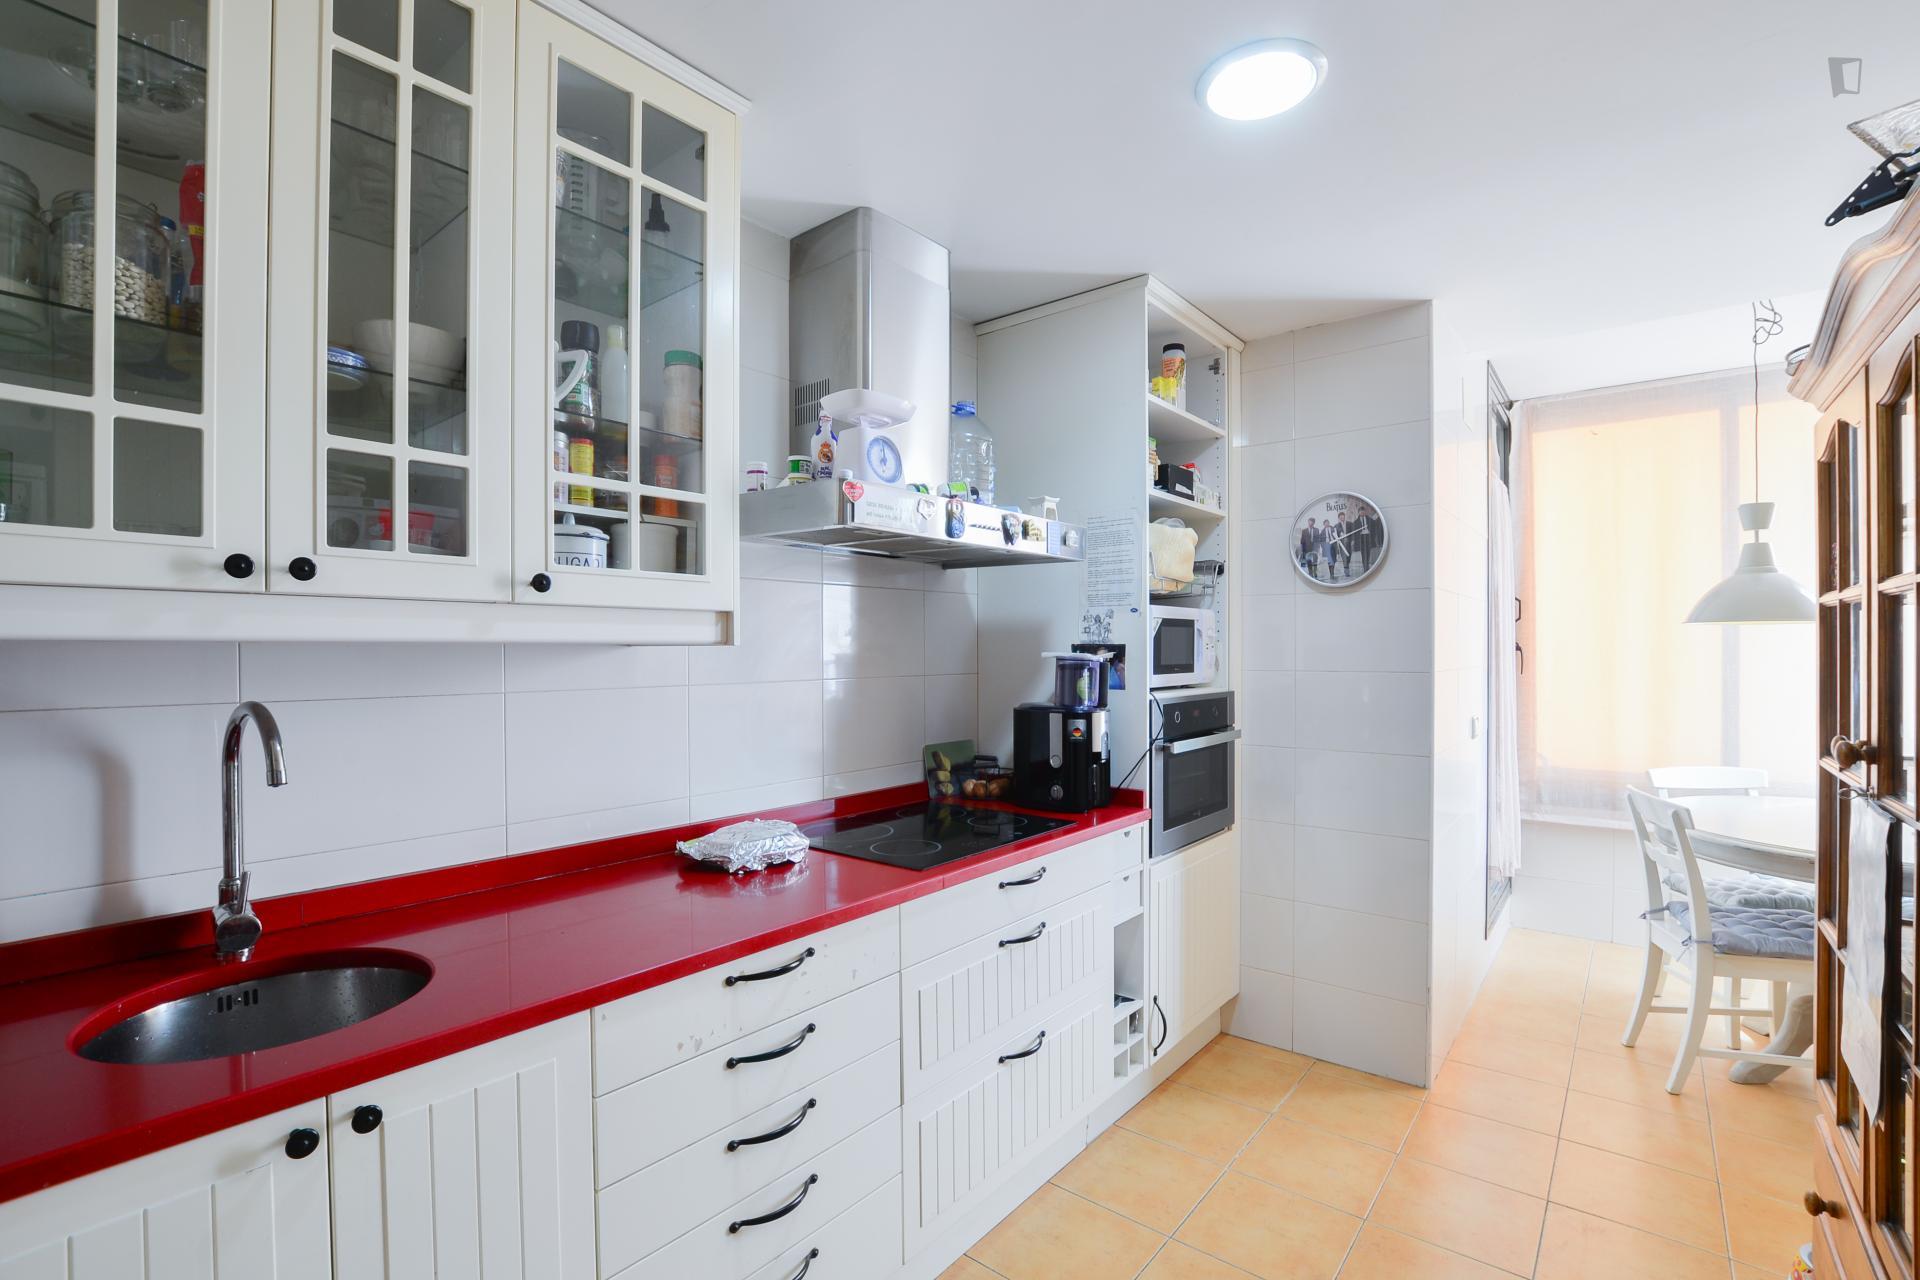 Padornelo - Shared apartment in Madrid